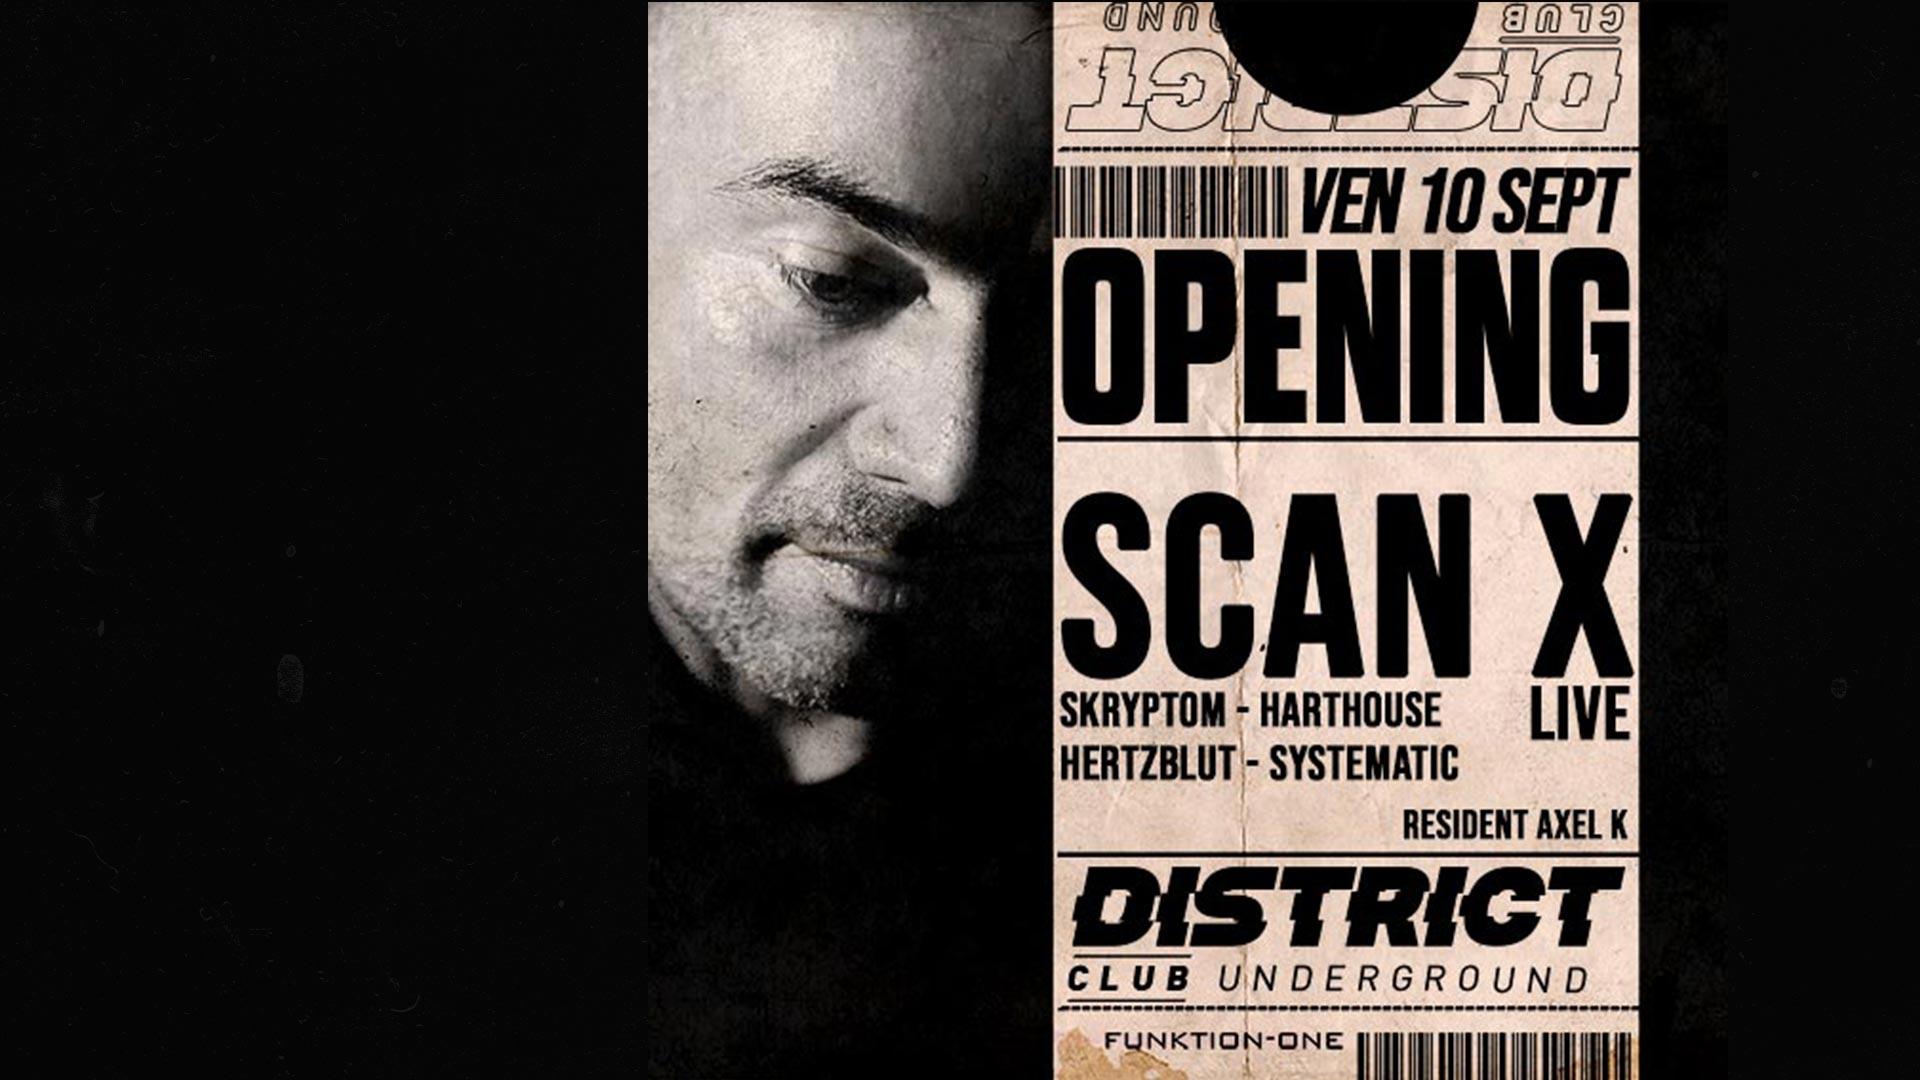 SCAN X LIVE / 𝗢pening Day 𝗜 / District Club Underground Avignon